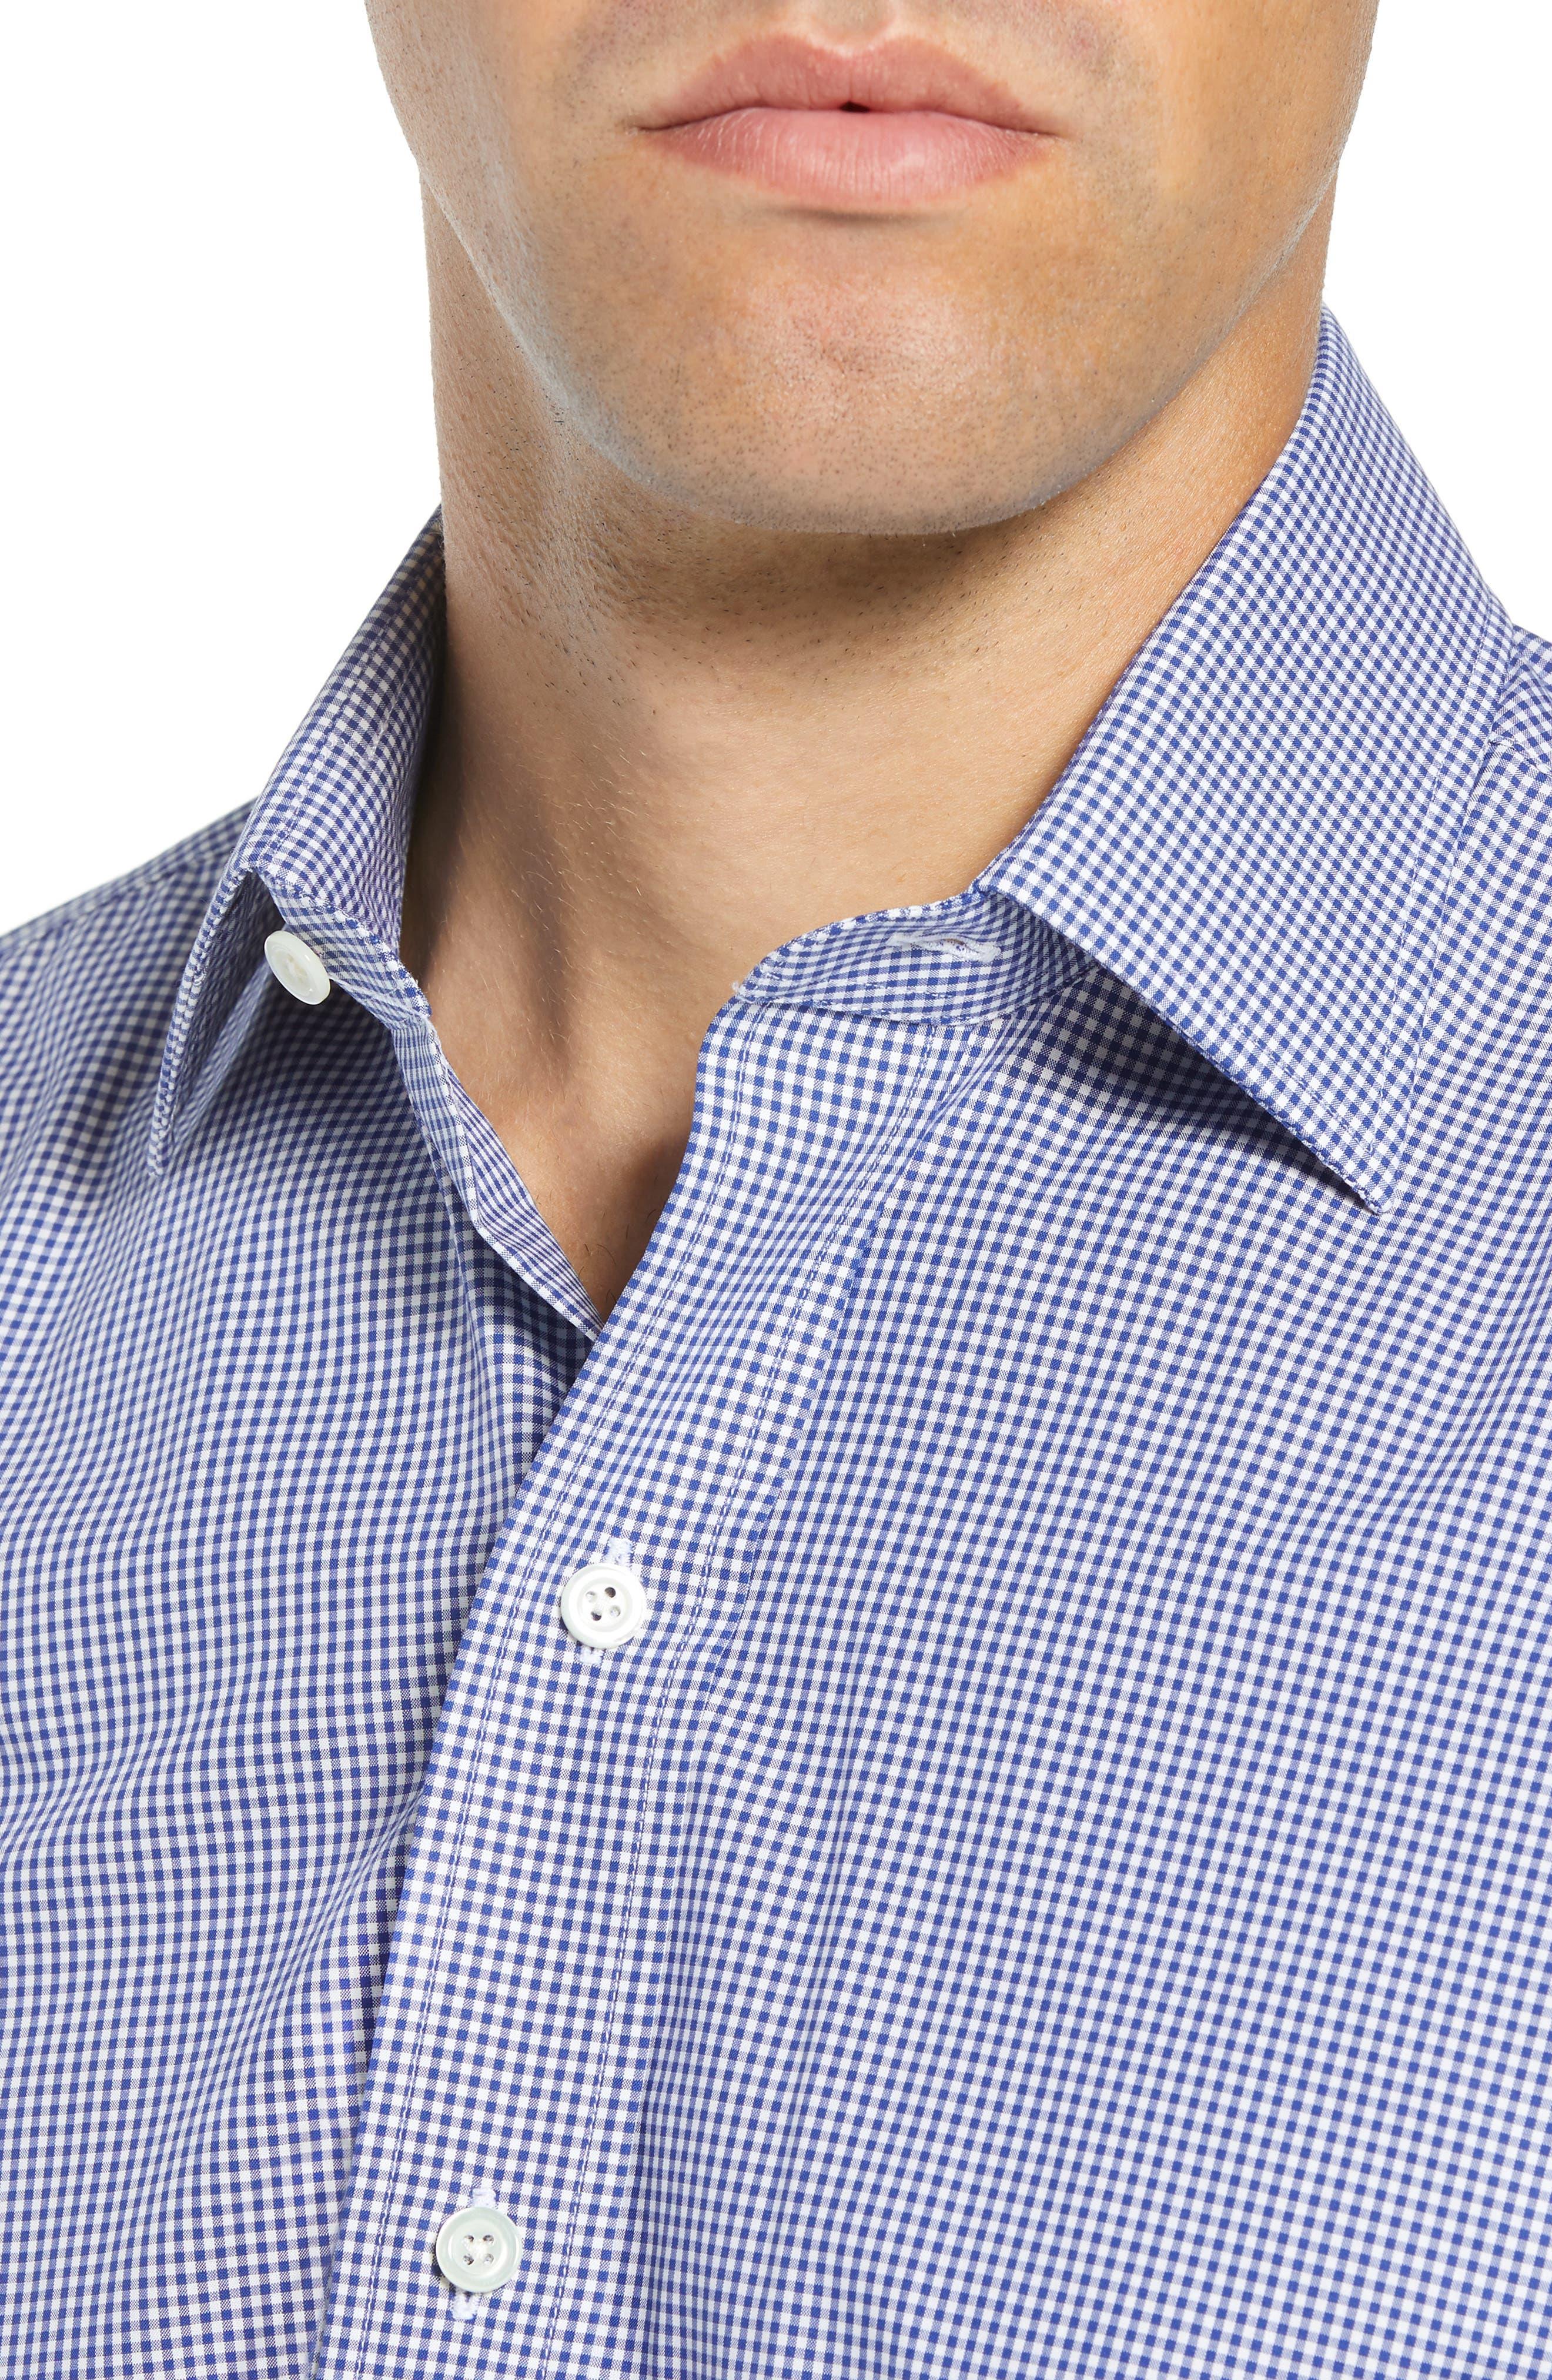 Classic Fit Gingham Dress Shirt,                             Alternate thumbnail 2, color,                             420